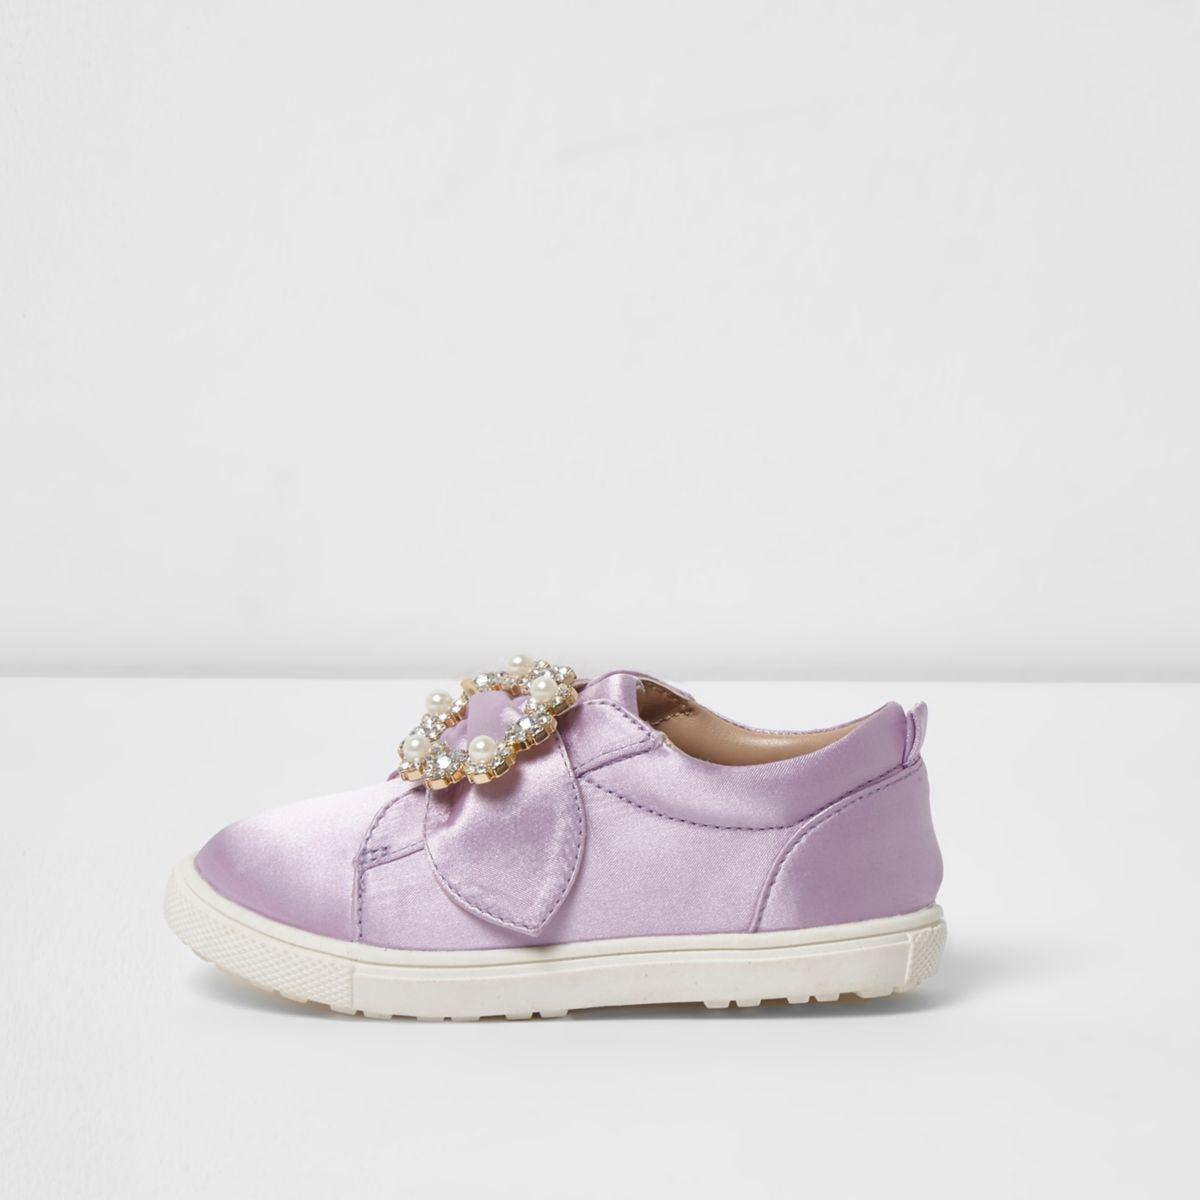 Tennis en satin lilas ornées mini fille